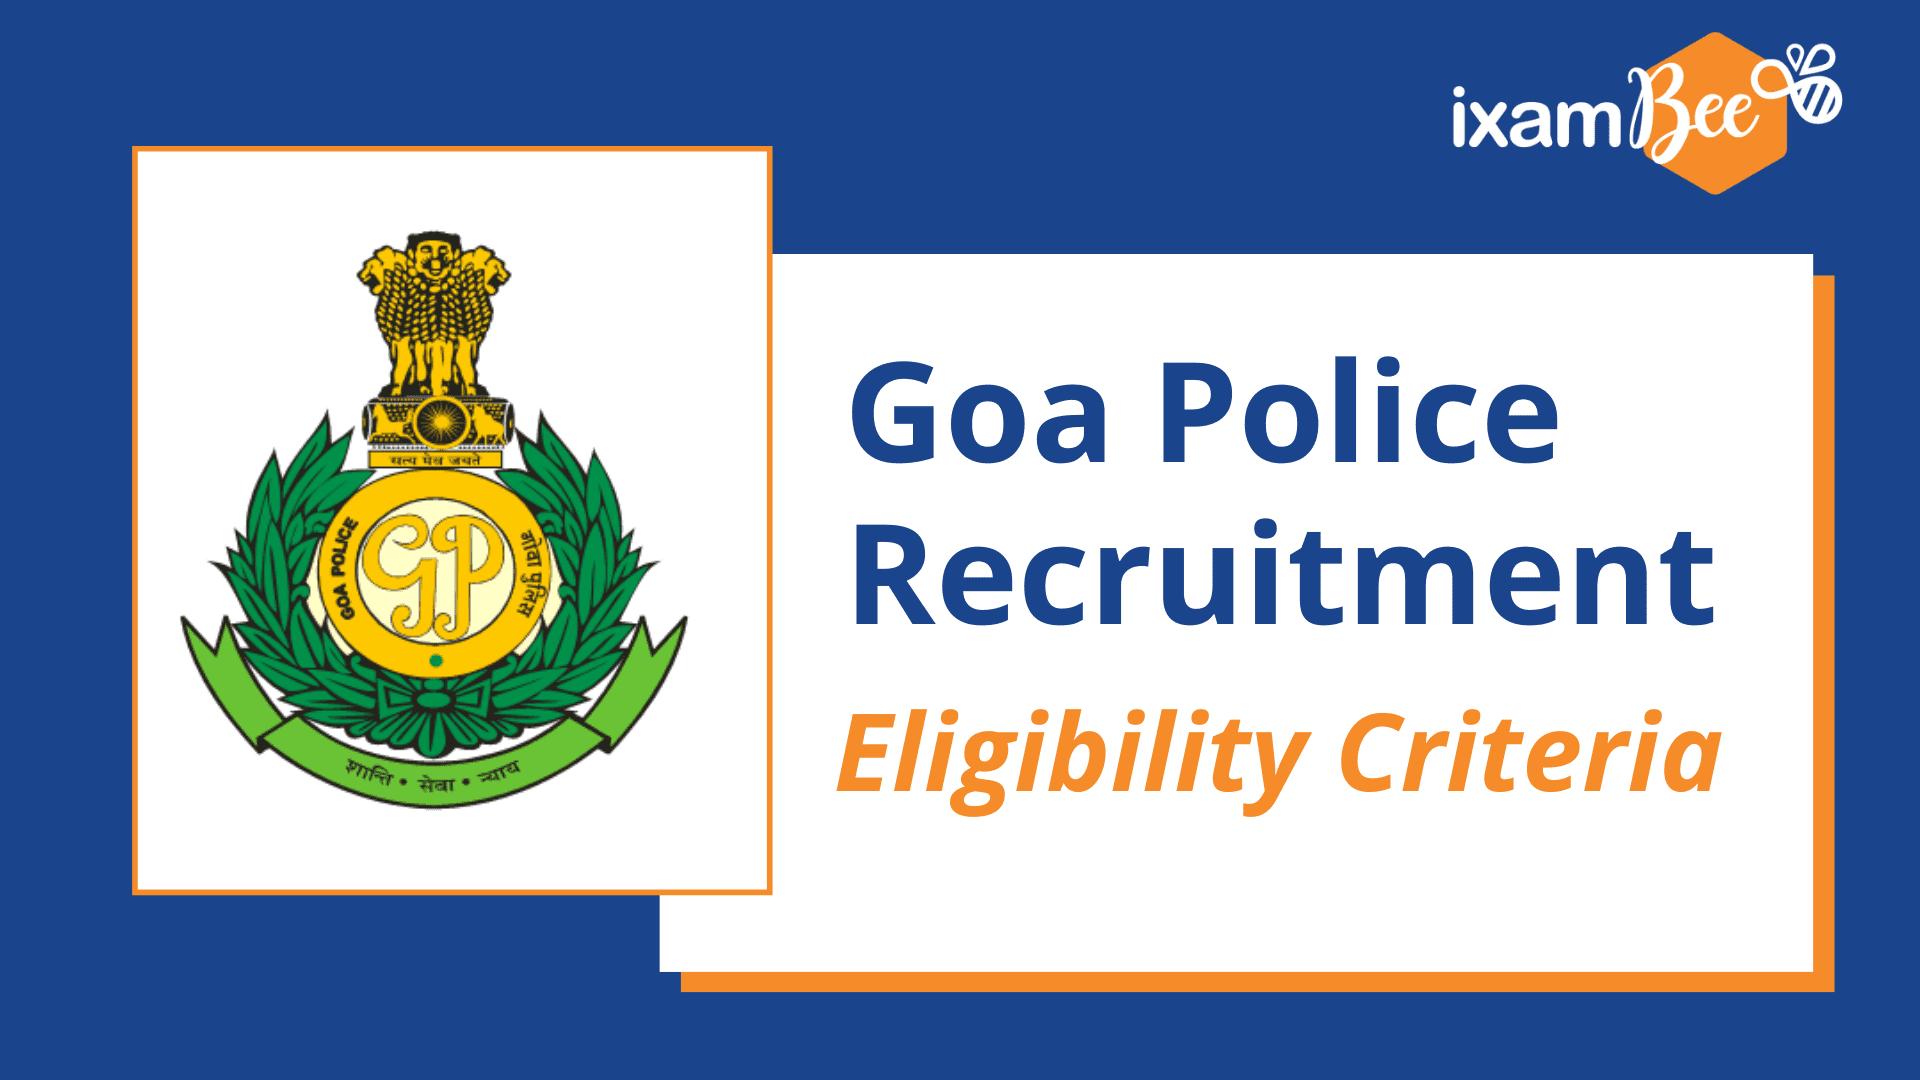 Goa Police Recruitment Eligibility Criteria